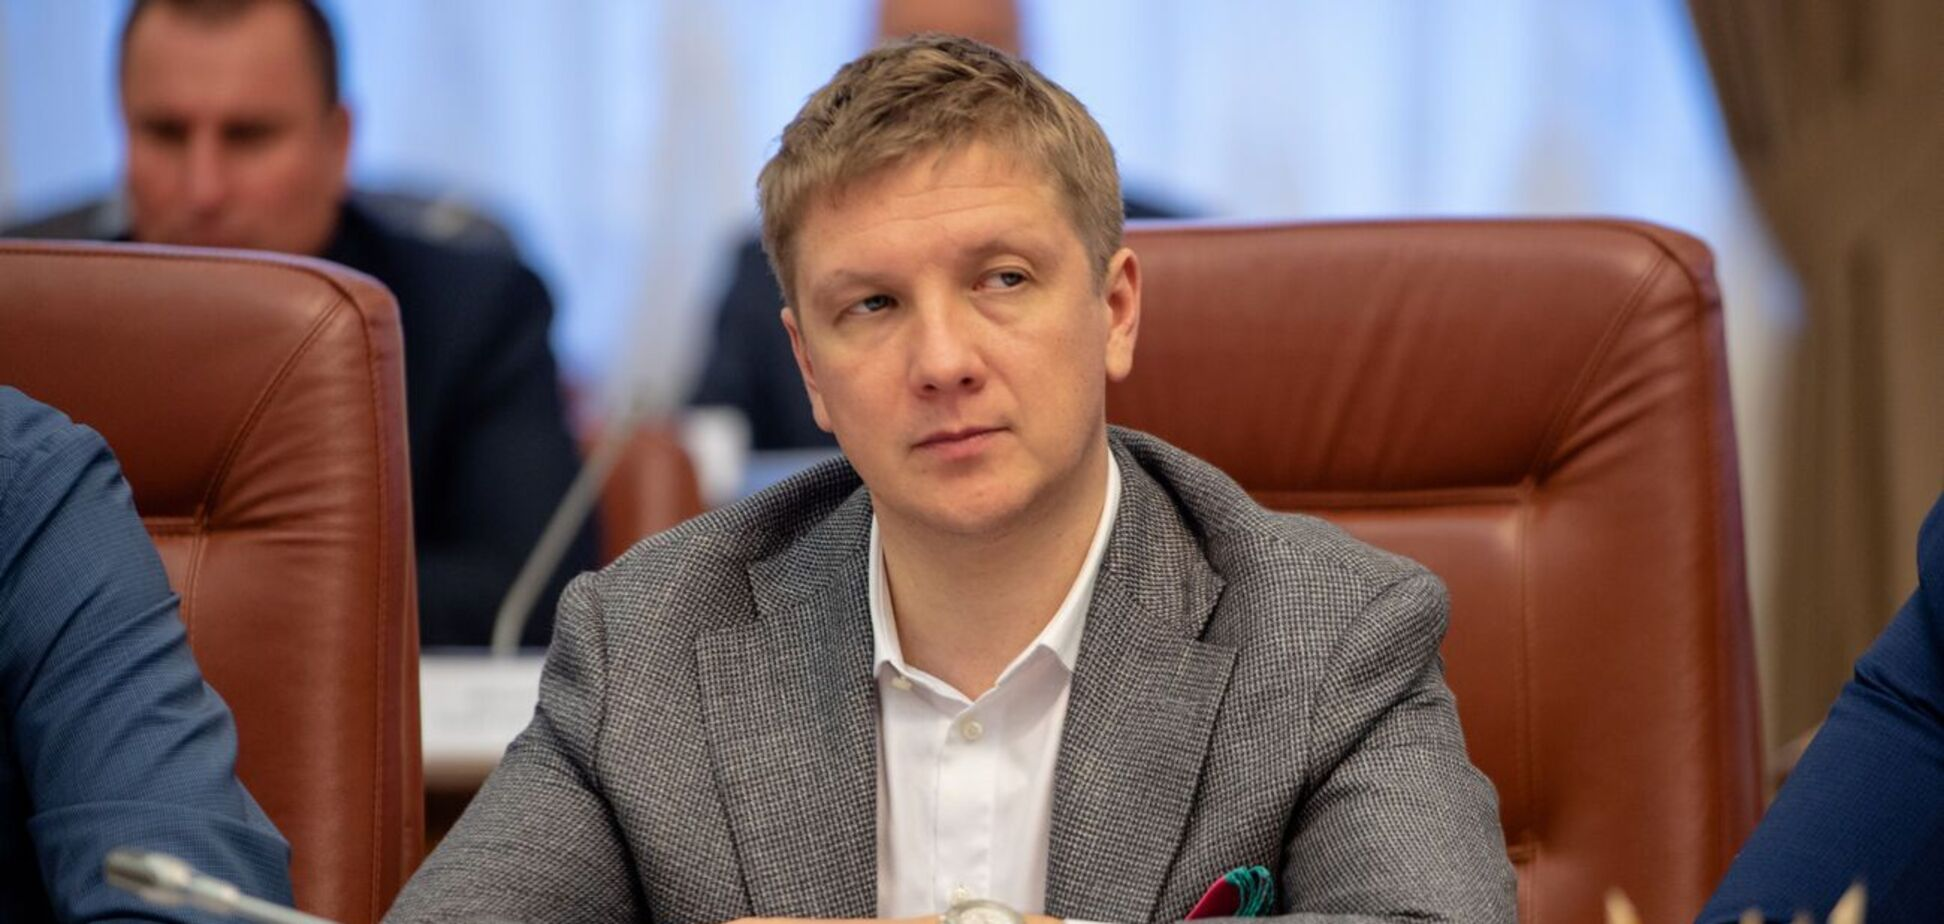 Глава 'Нафтогазу' Коболєв чотири роки отримує премії, не виконуючи KPI, – експерт